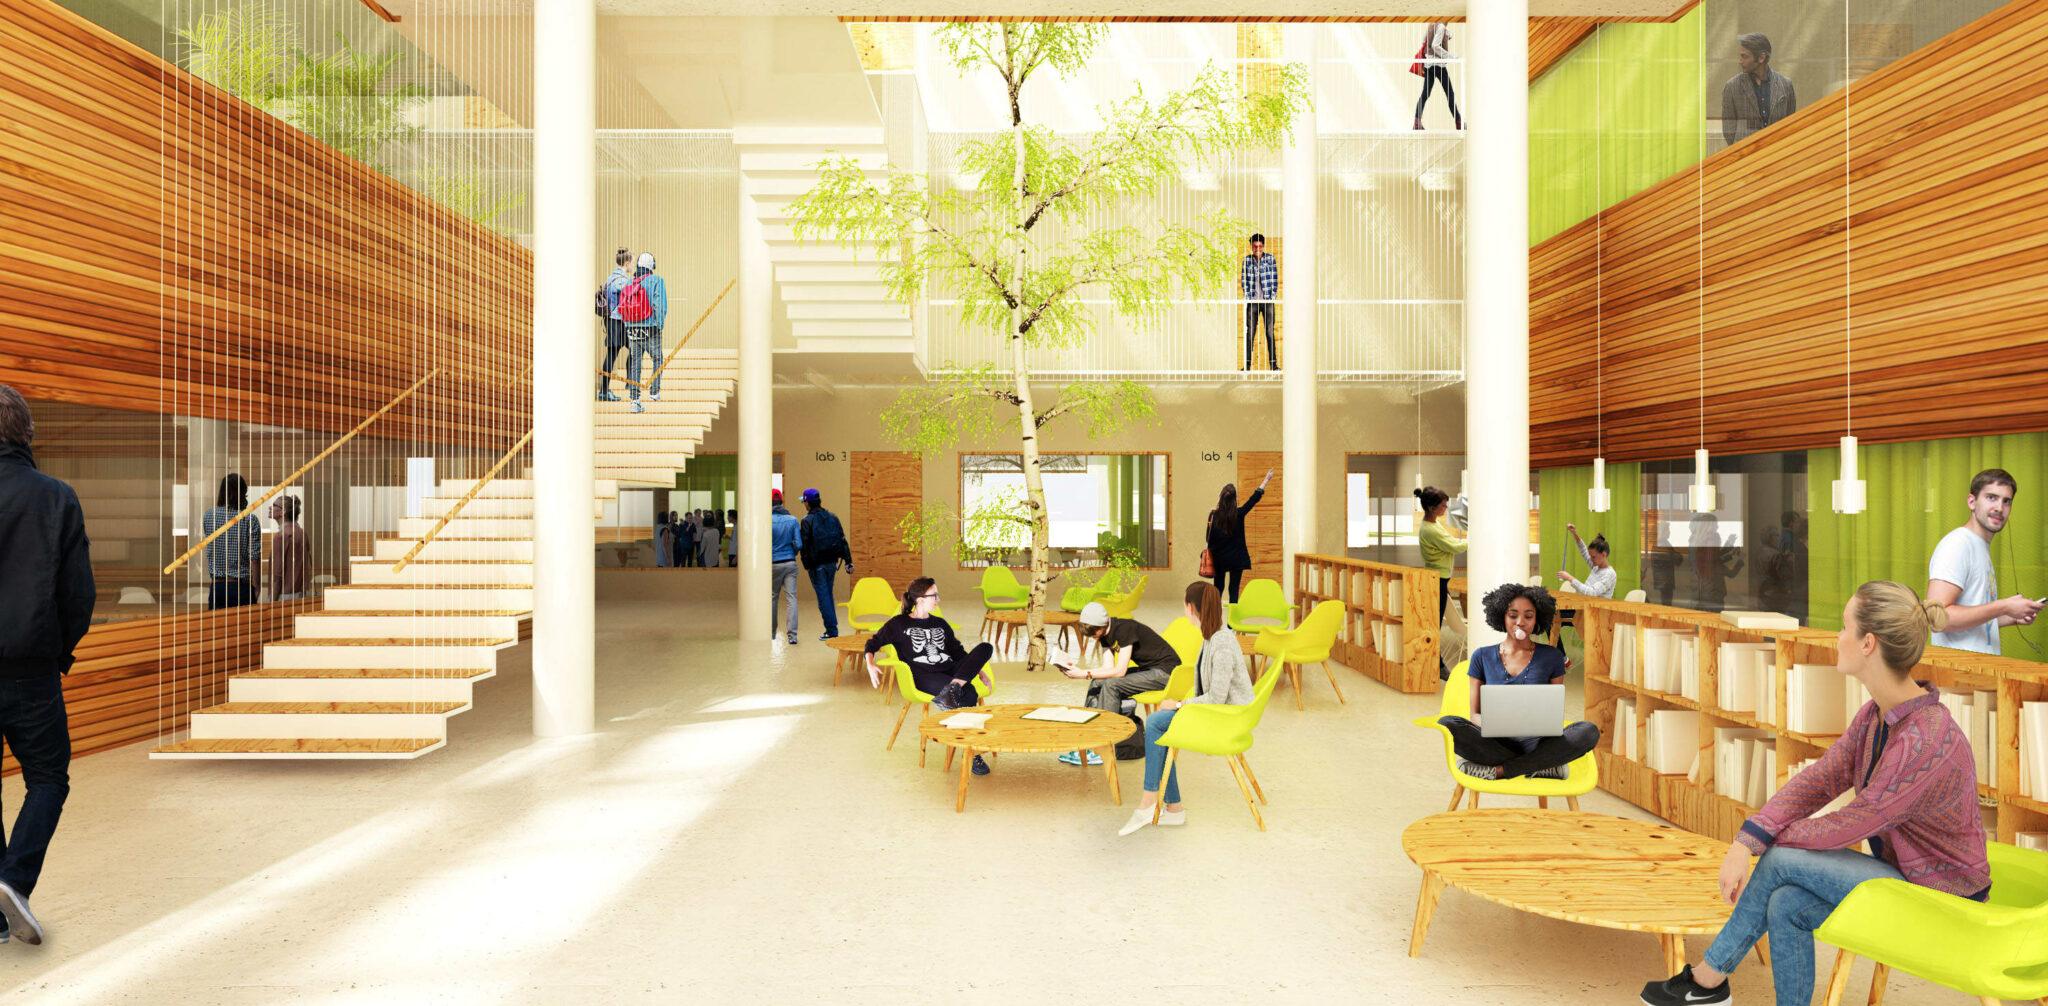 mks-architetti-scuoleinnovative